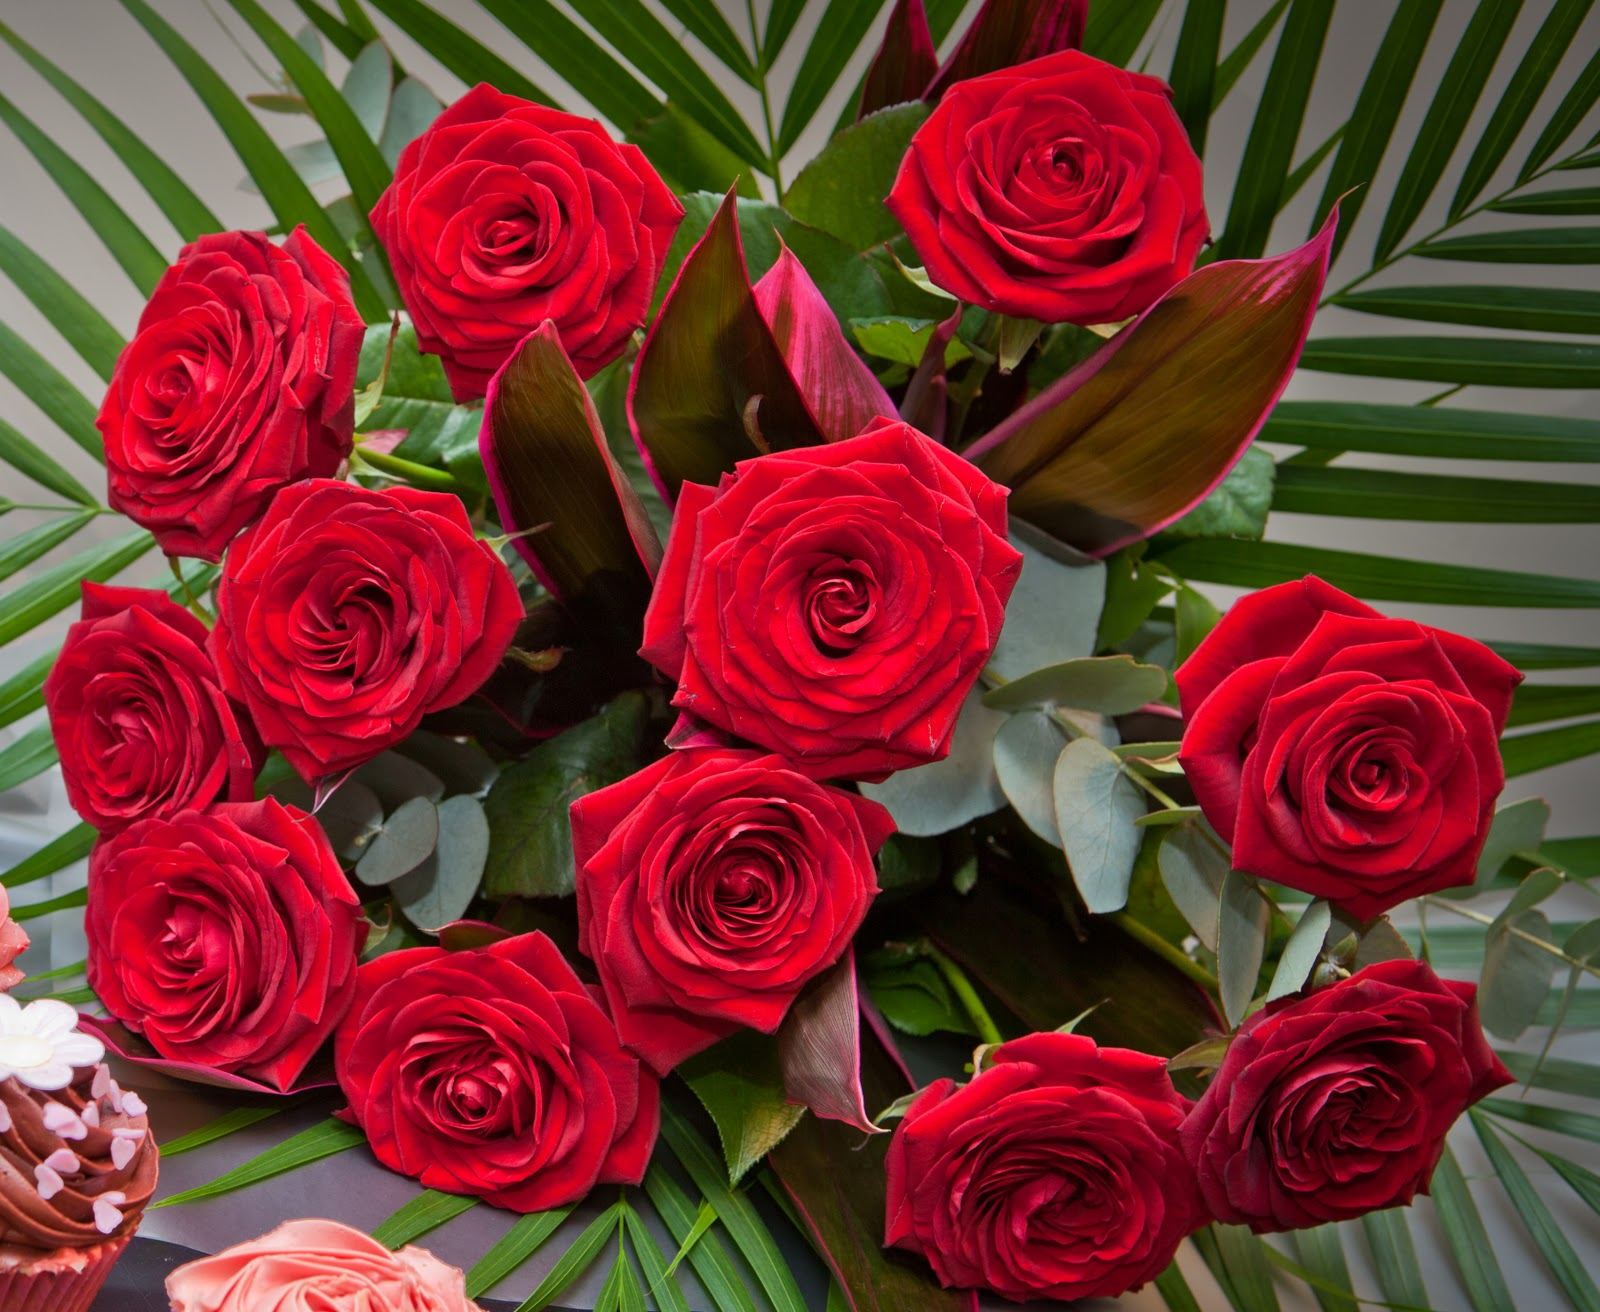 Red roses flower beautiful red rose wallpaper angelic hugs red roses flower beautiful red rose wallpaper izmirmasajfo Gallery